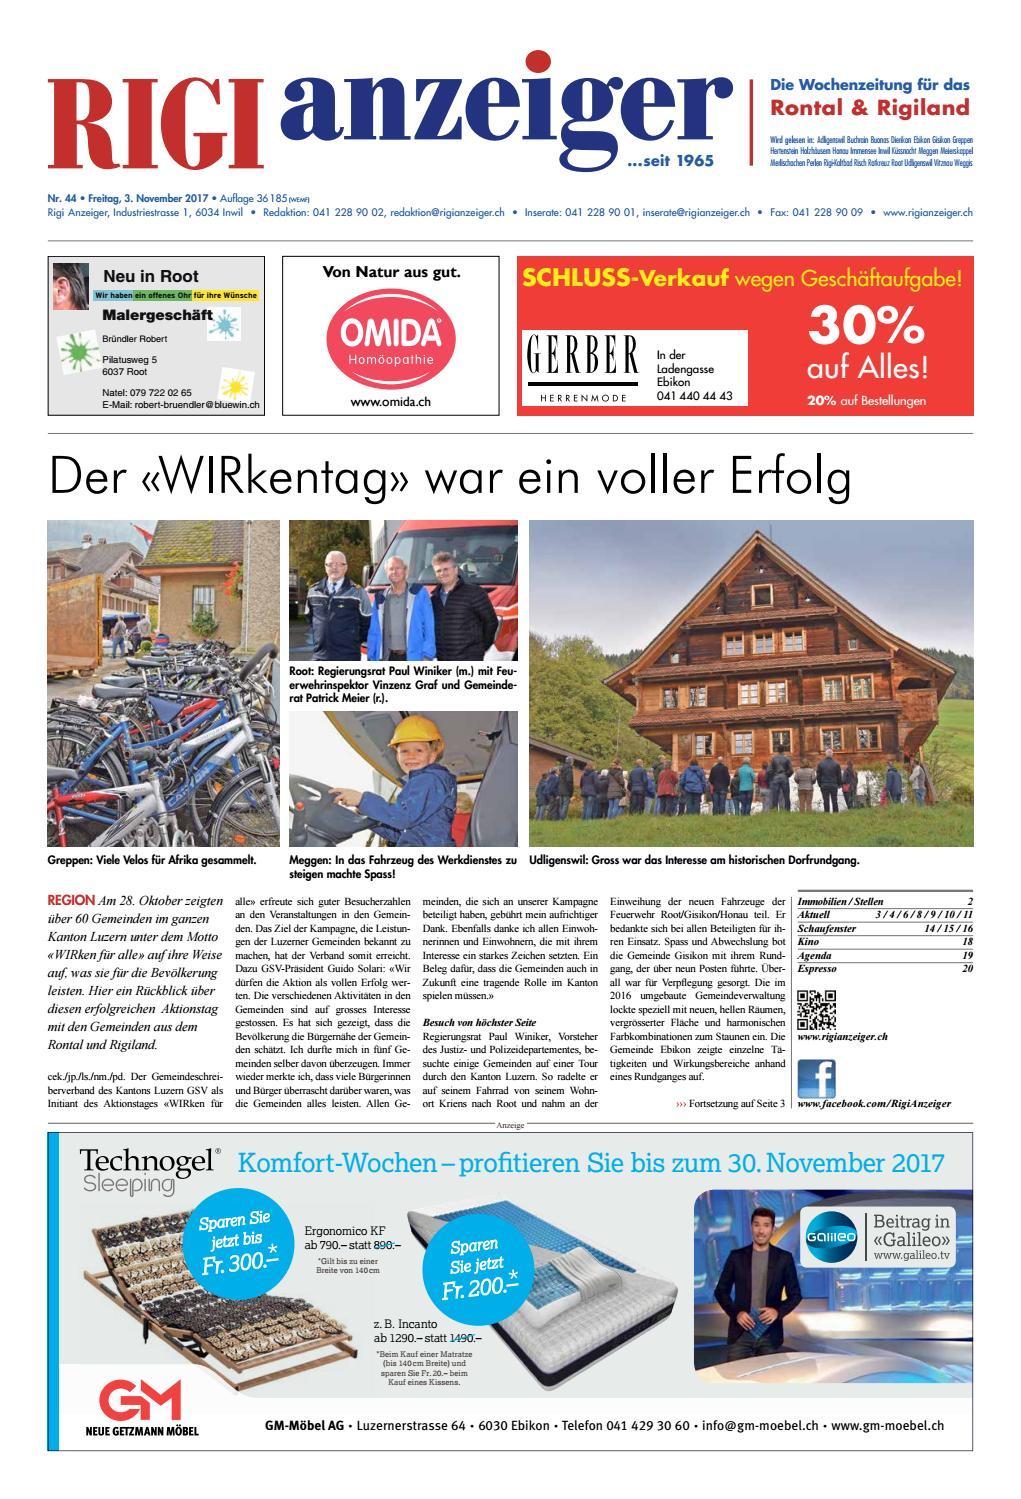 Rigi Anzeiger, 3. November 2017 by Rigi Anzeiger GmbH - issuu